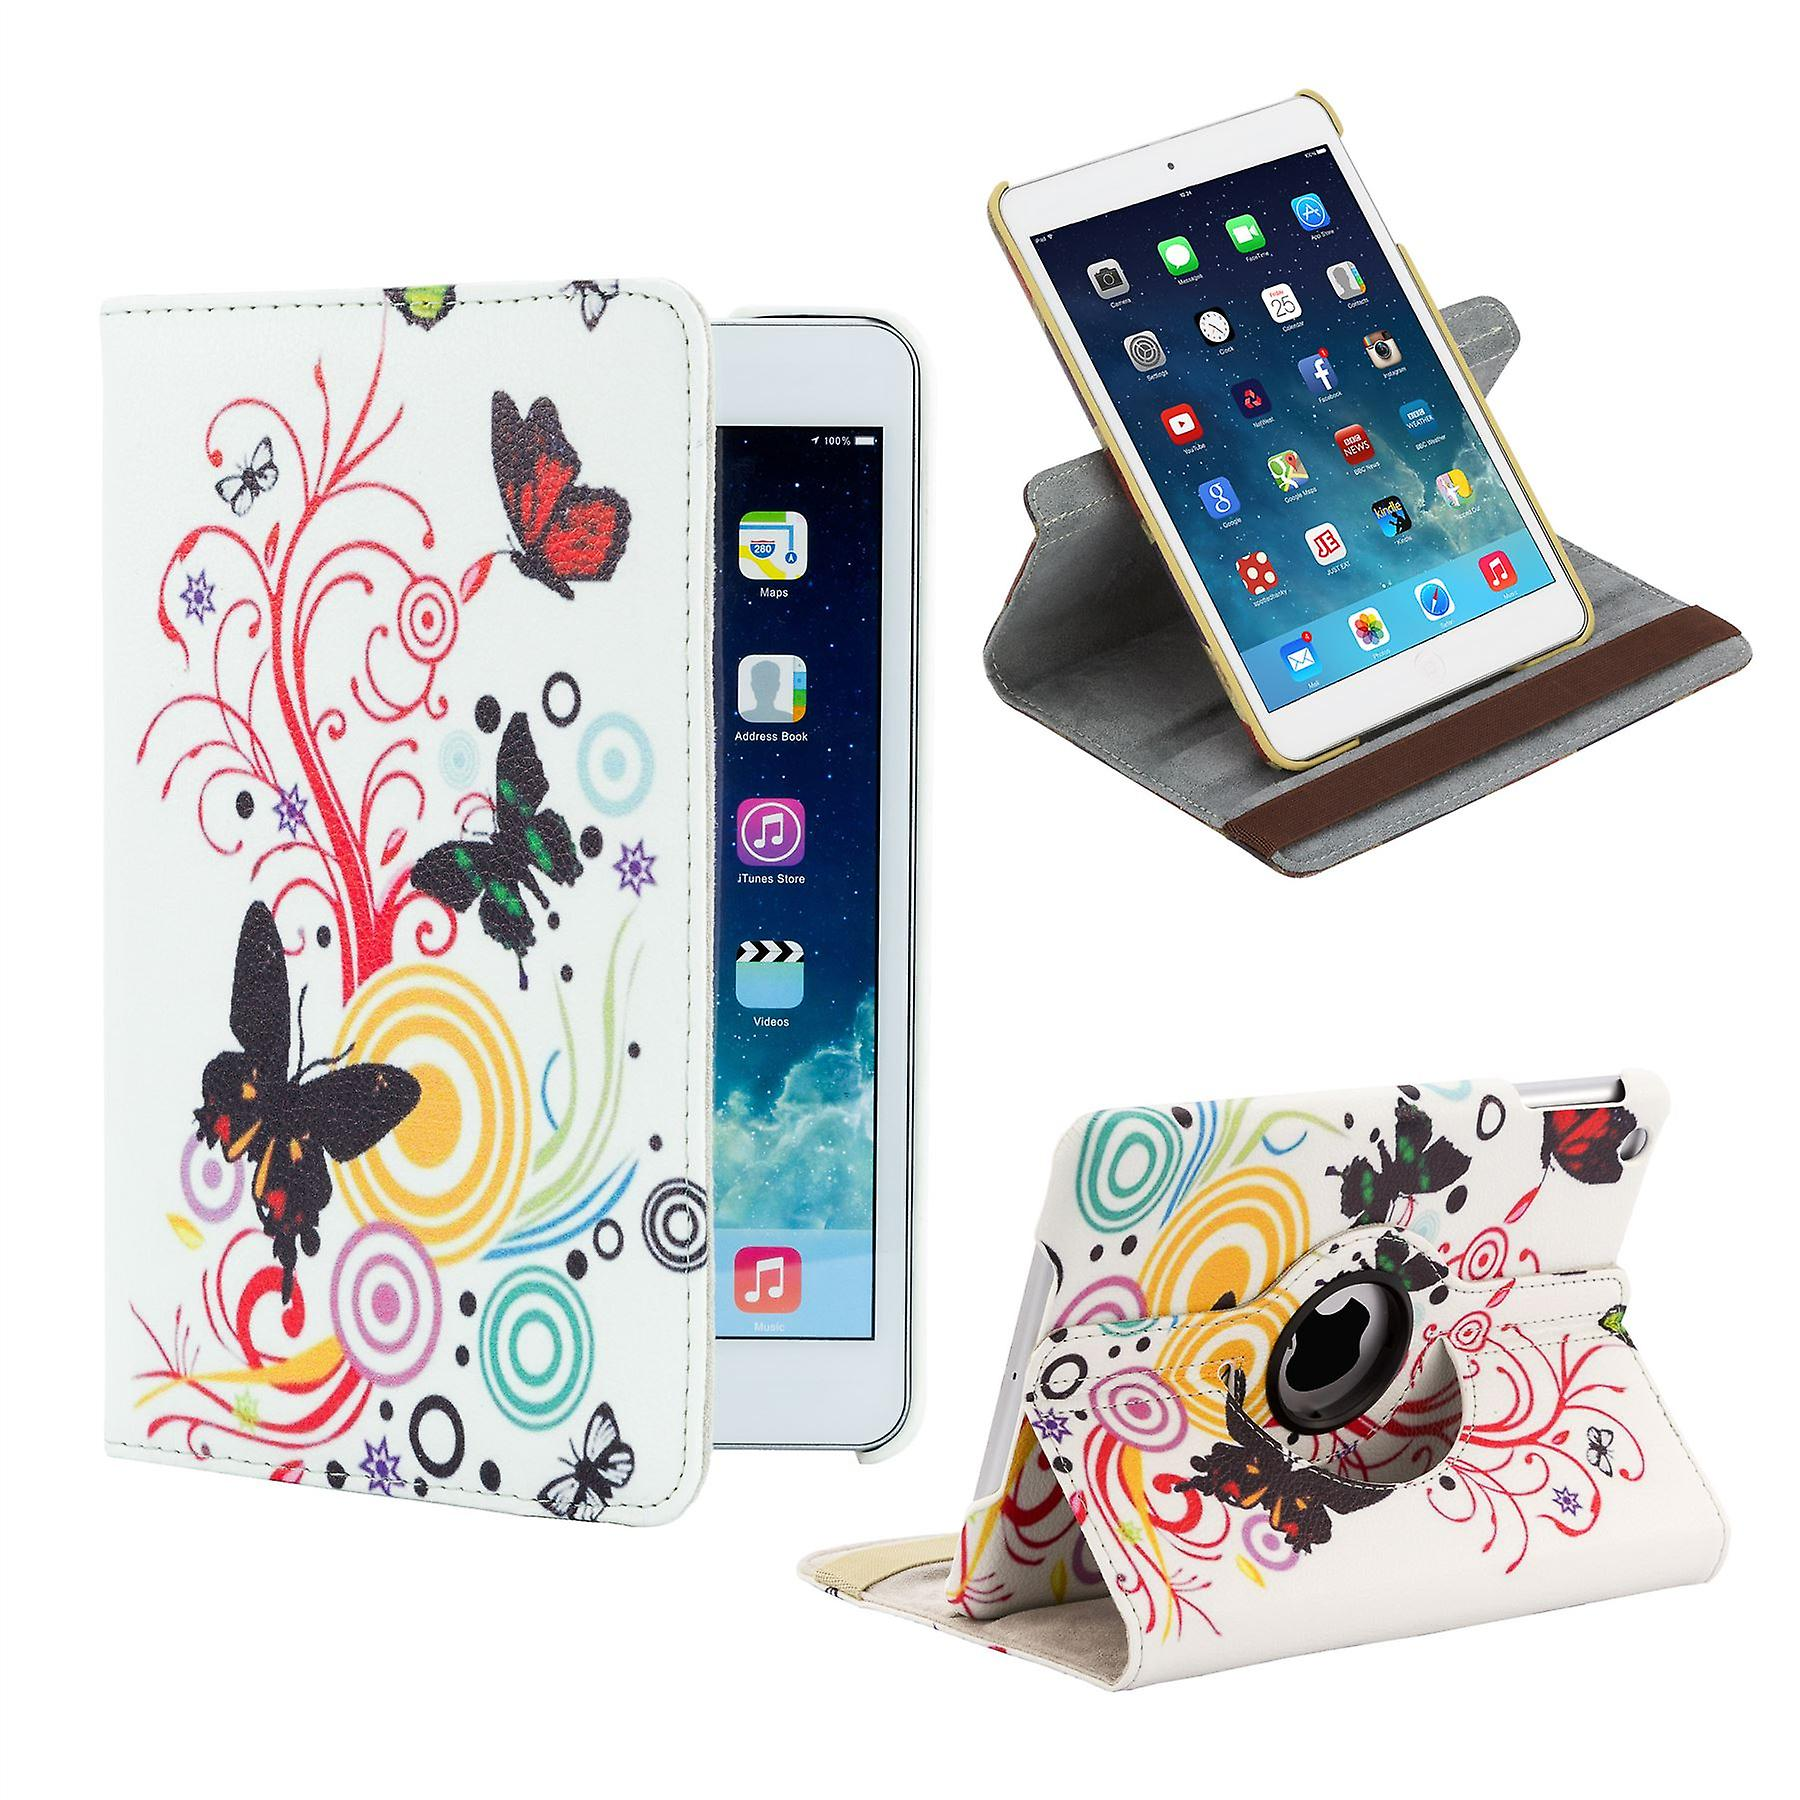 360 degree Design Book case for Apple iPad Mini 4th Gen - Colour Butterfly